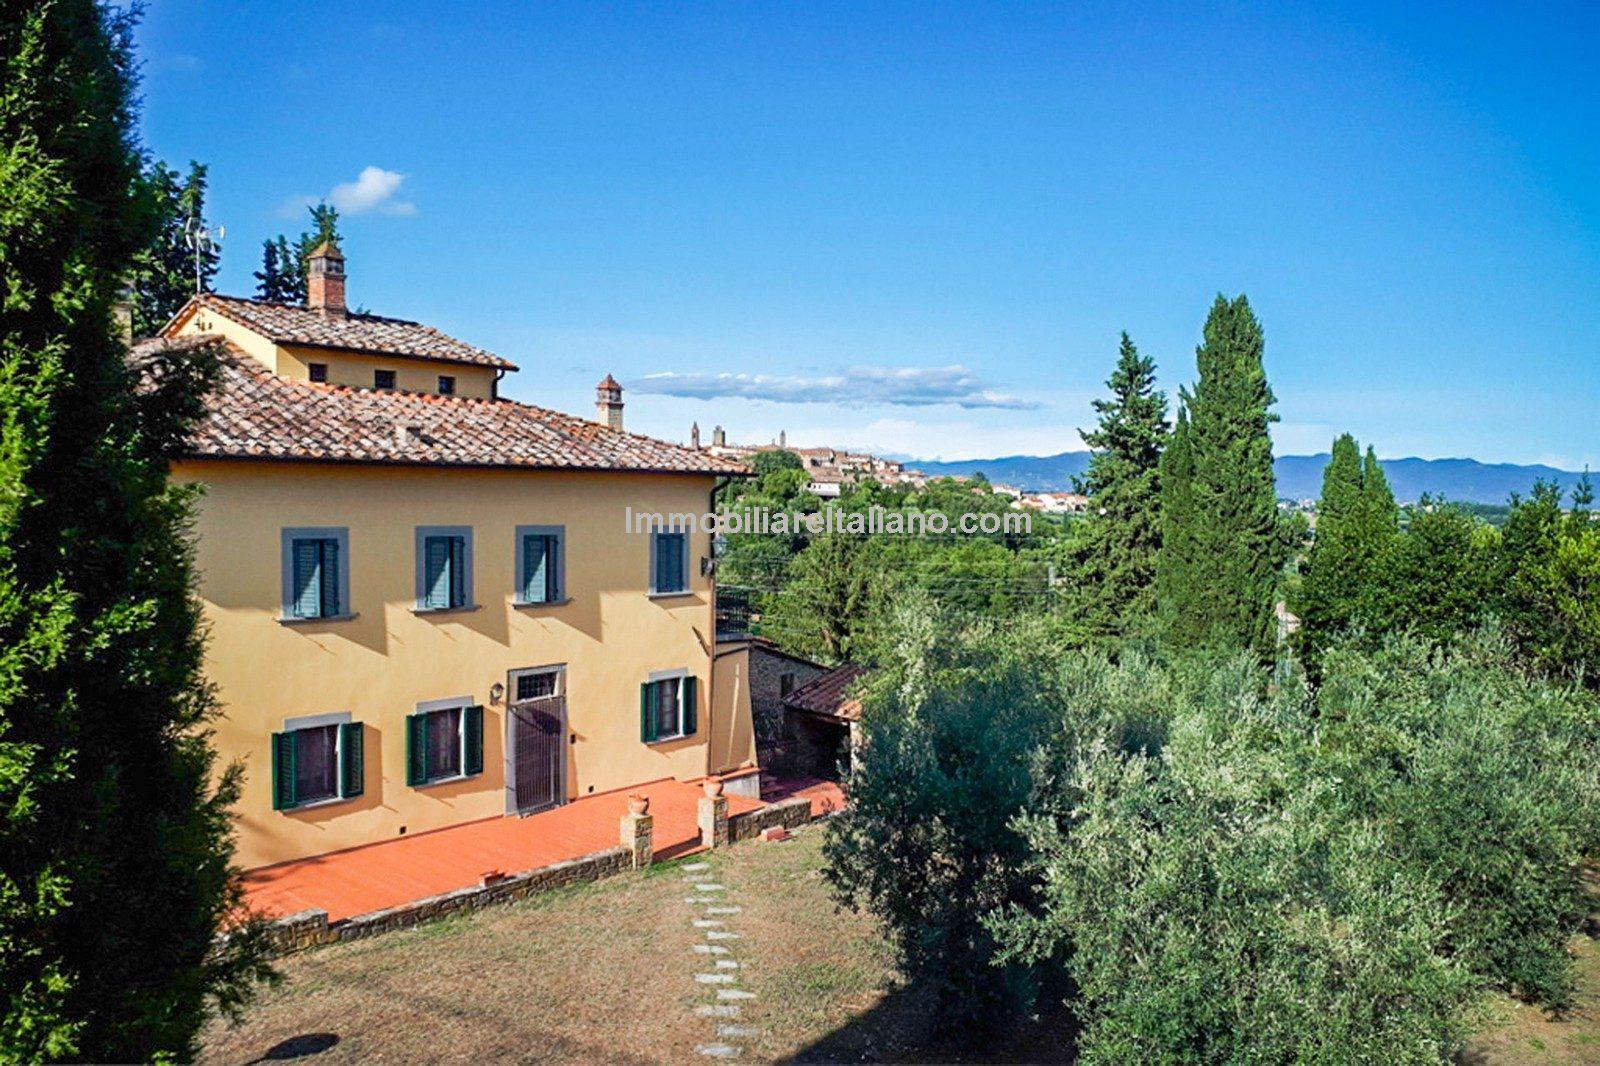 Restored 19th Century Tuscan villa with annexes and garden